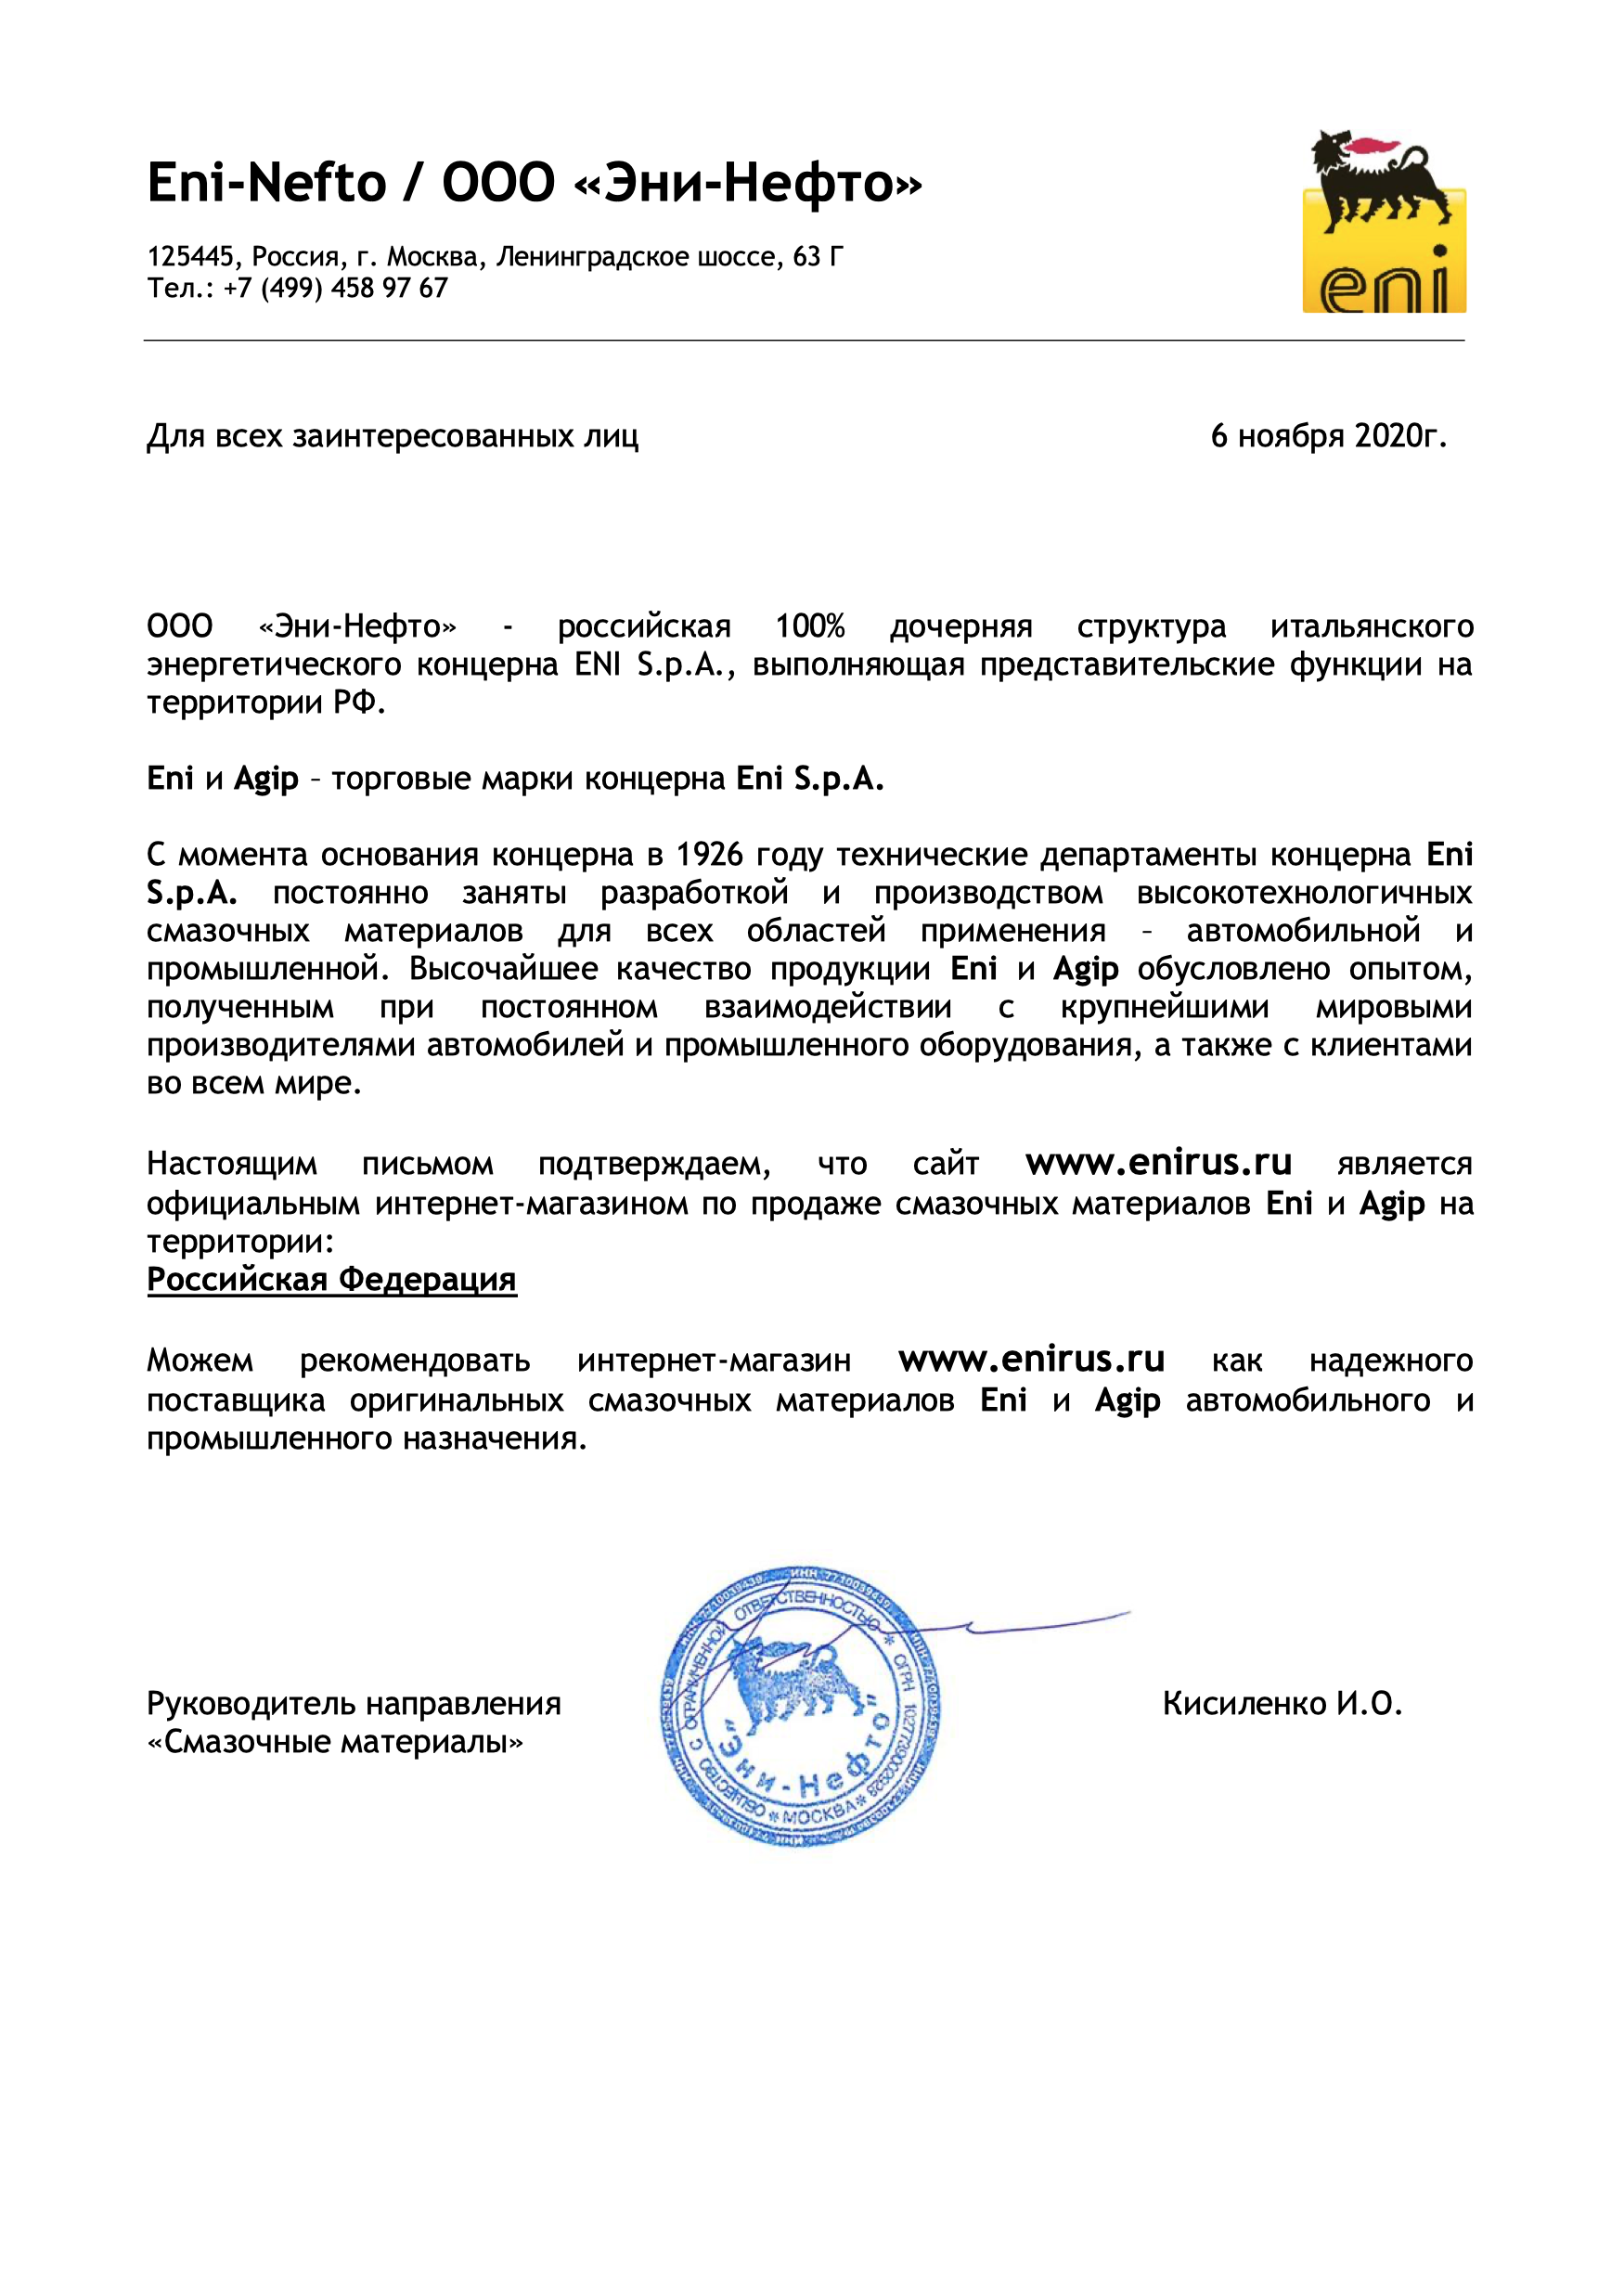 Дилерский сертификат Enirus